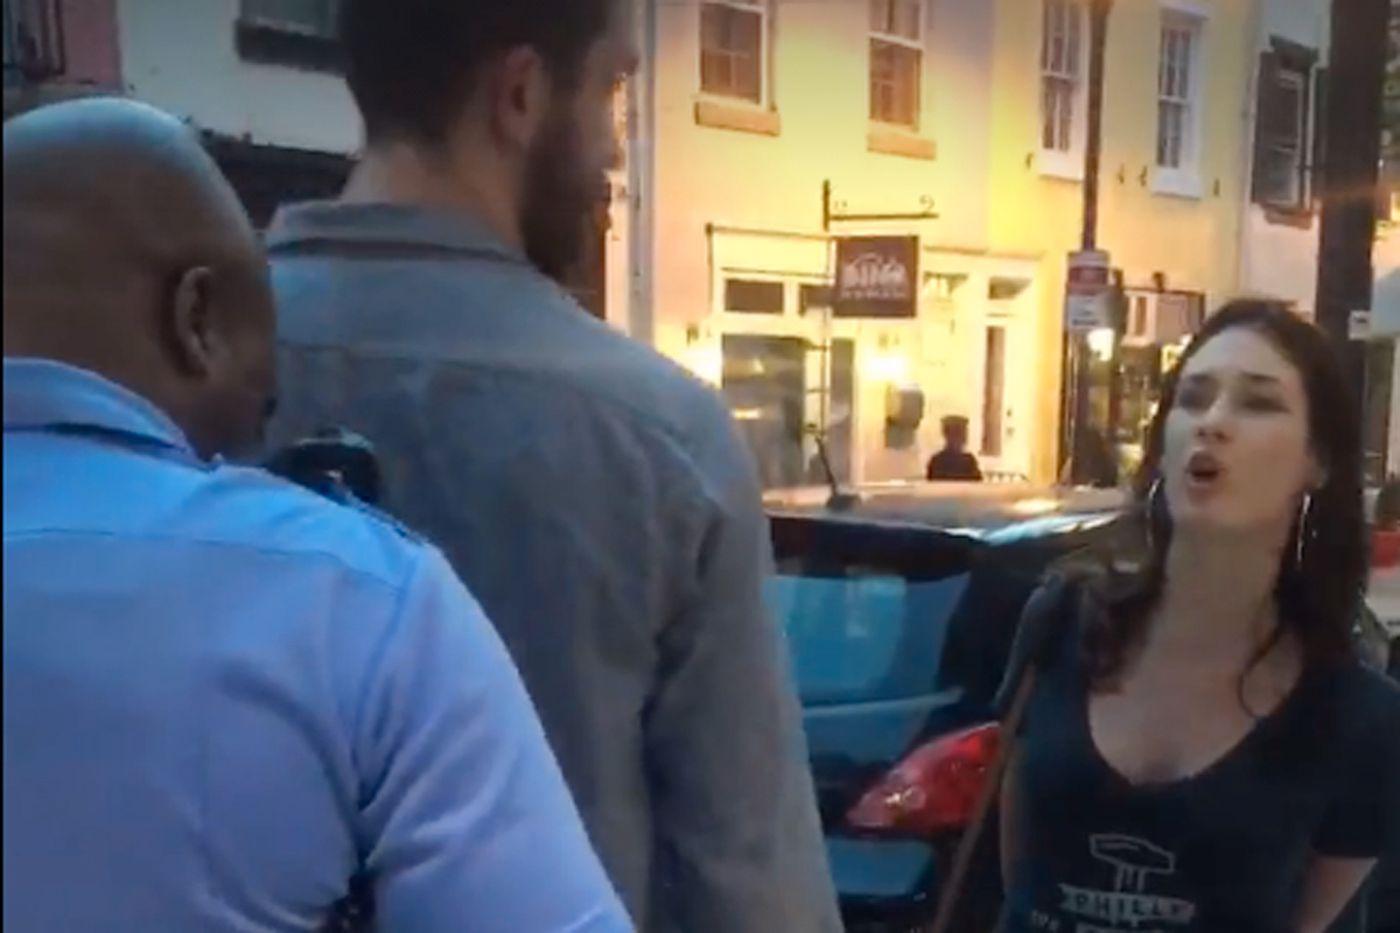 PHL 17 staffer arrested after profane tirade against Philly cop